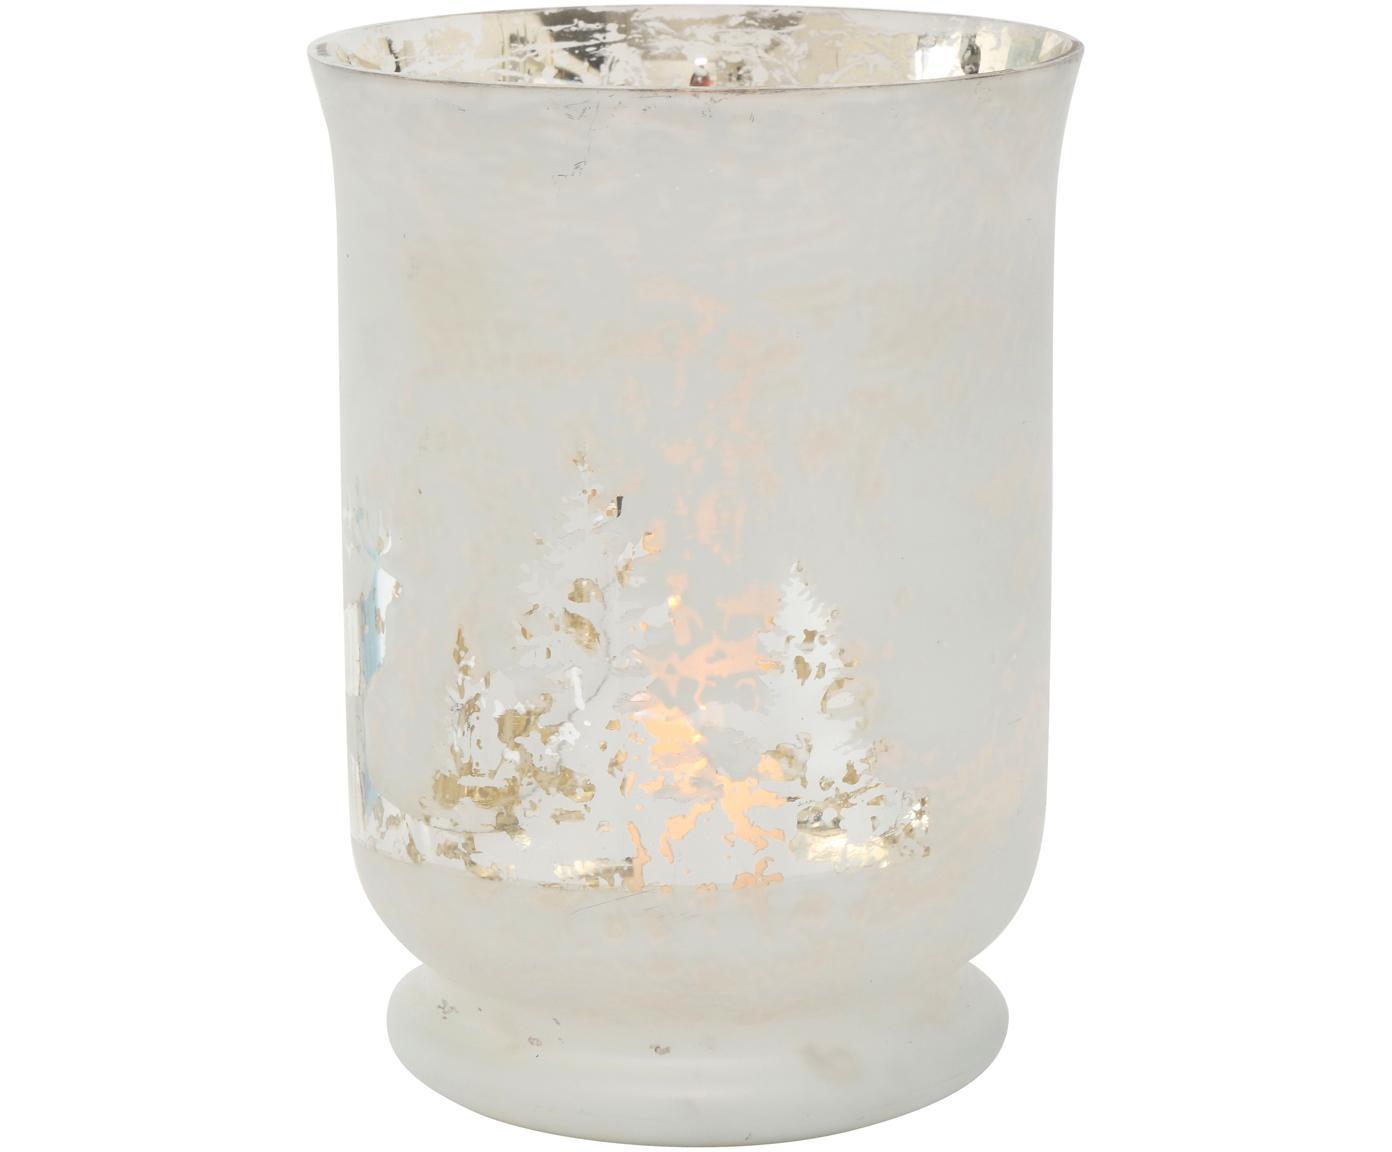 Portacandela Bonaparte, Vetro verniciato, Bianco latteo, argento, Ø 14 x Alt. 19 cm